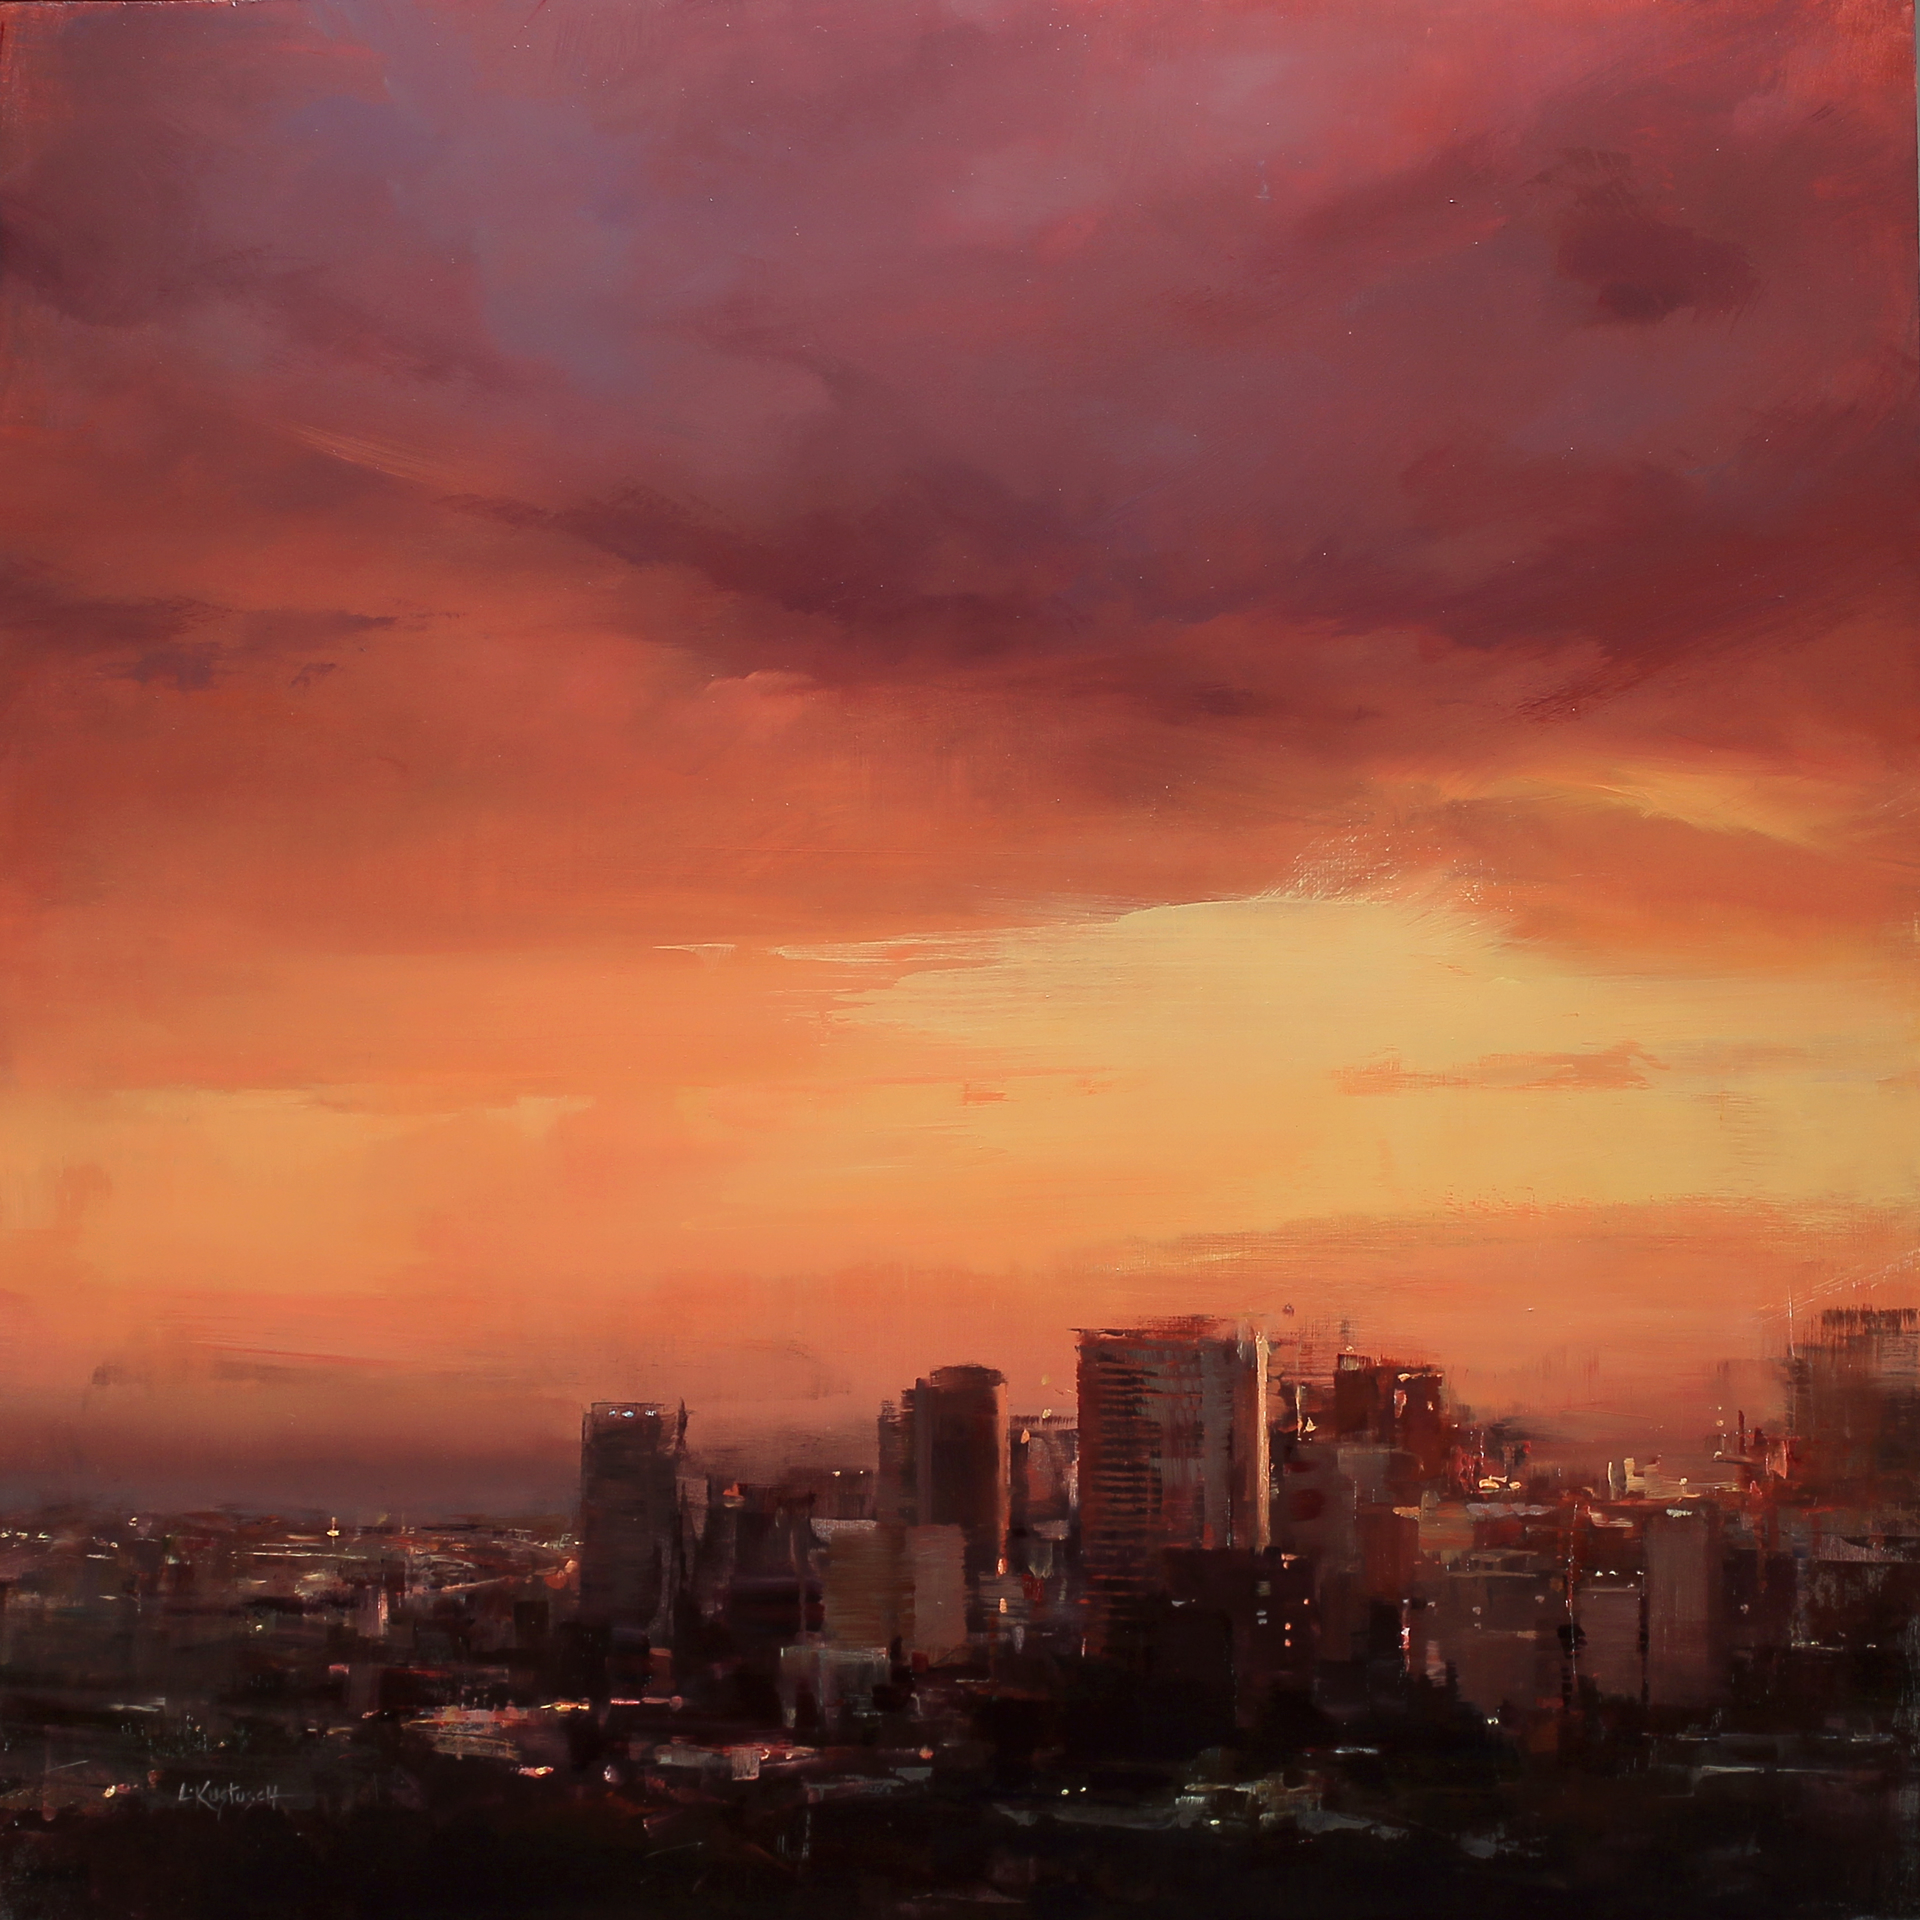 Beneath the Setting Sun by Lindsey Kustusch